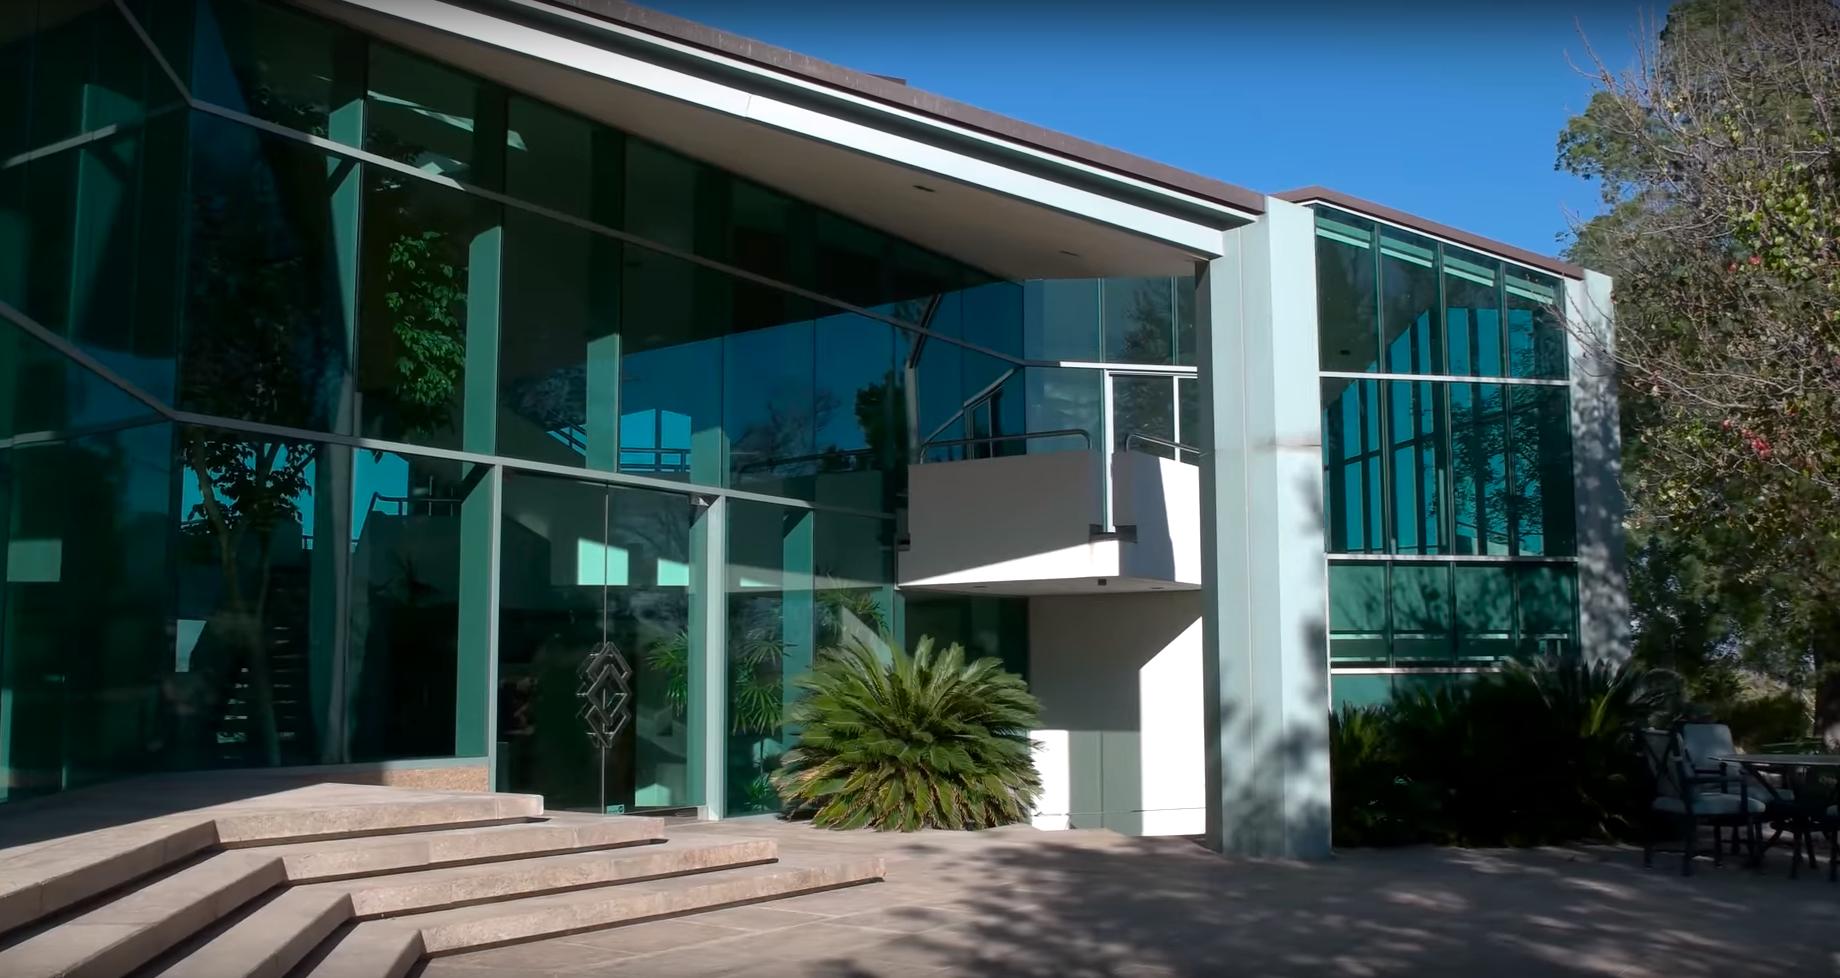 Pharrell Williams' glass house in Beverly Hills